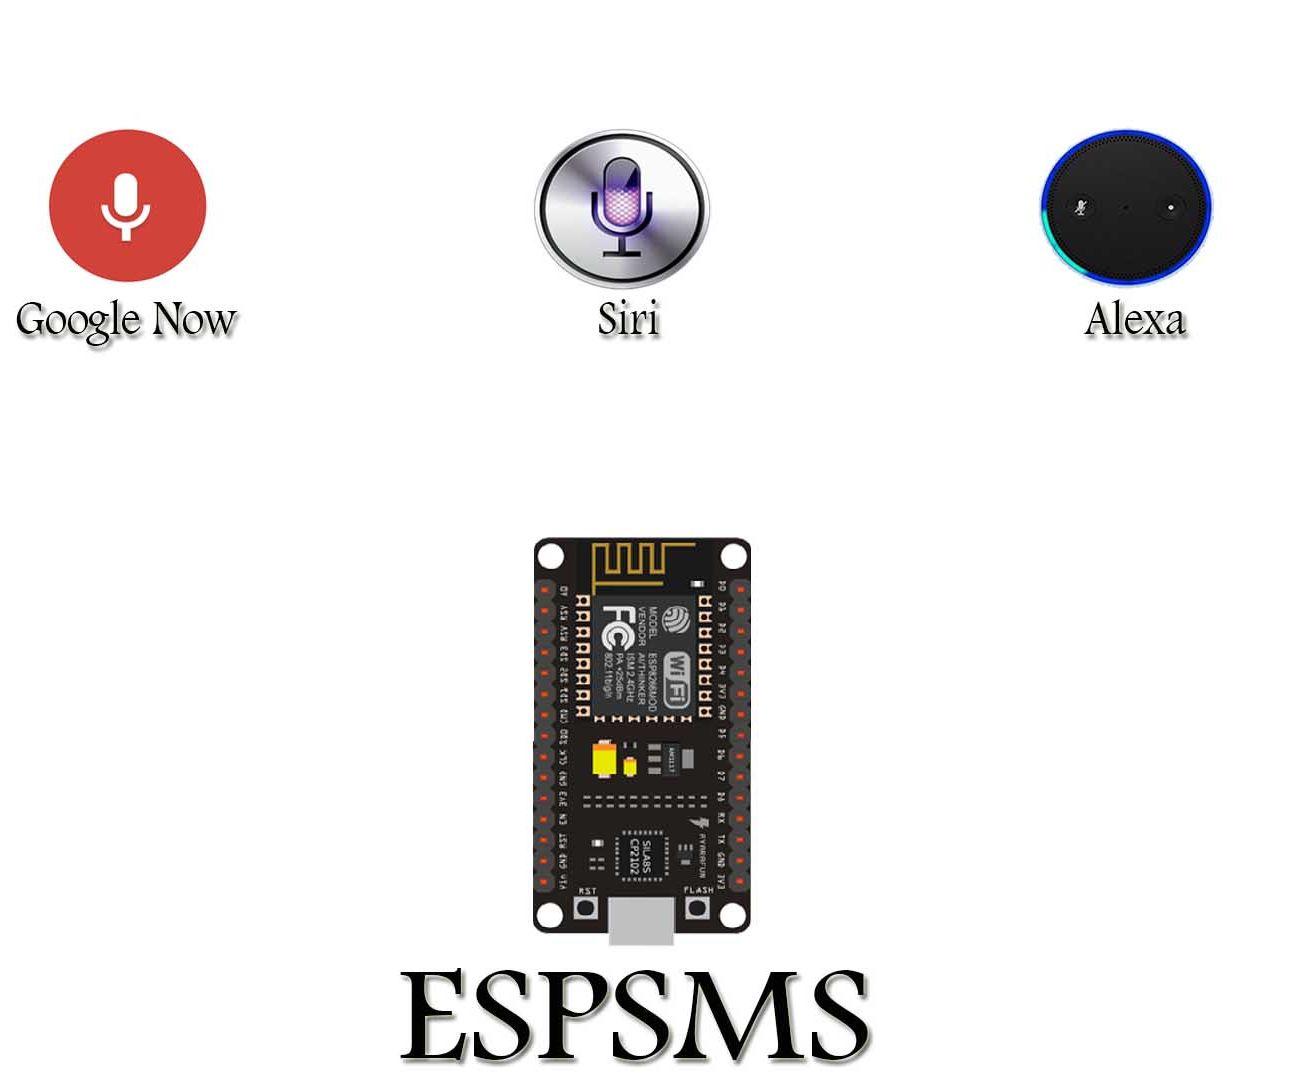 DIY personal assistant ESPSMS using Esp8266 12e